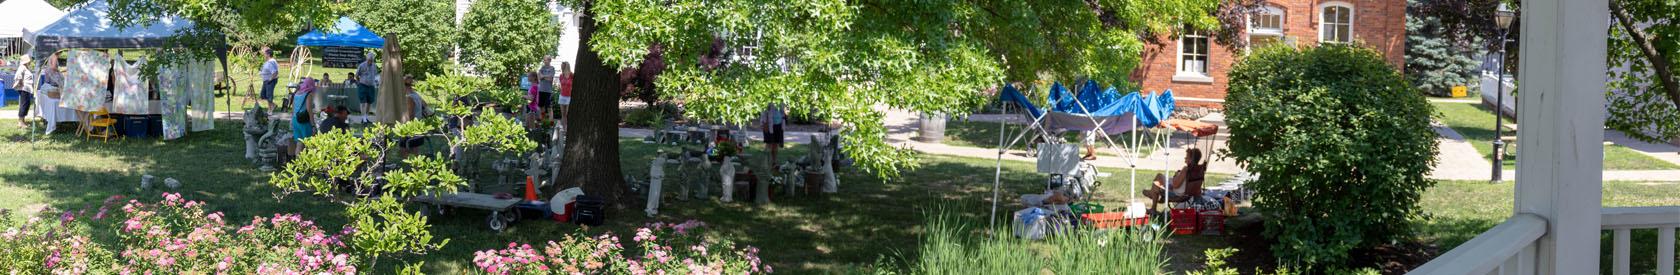 Troy Garden Walk